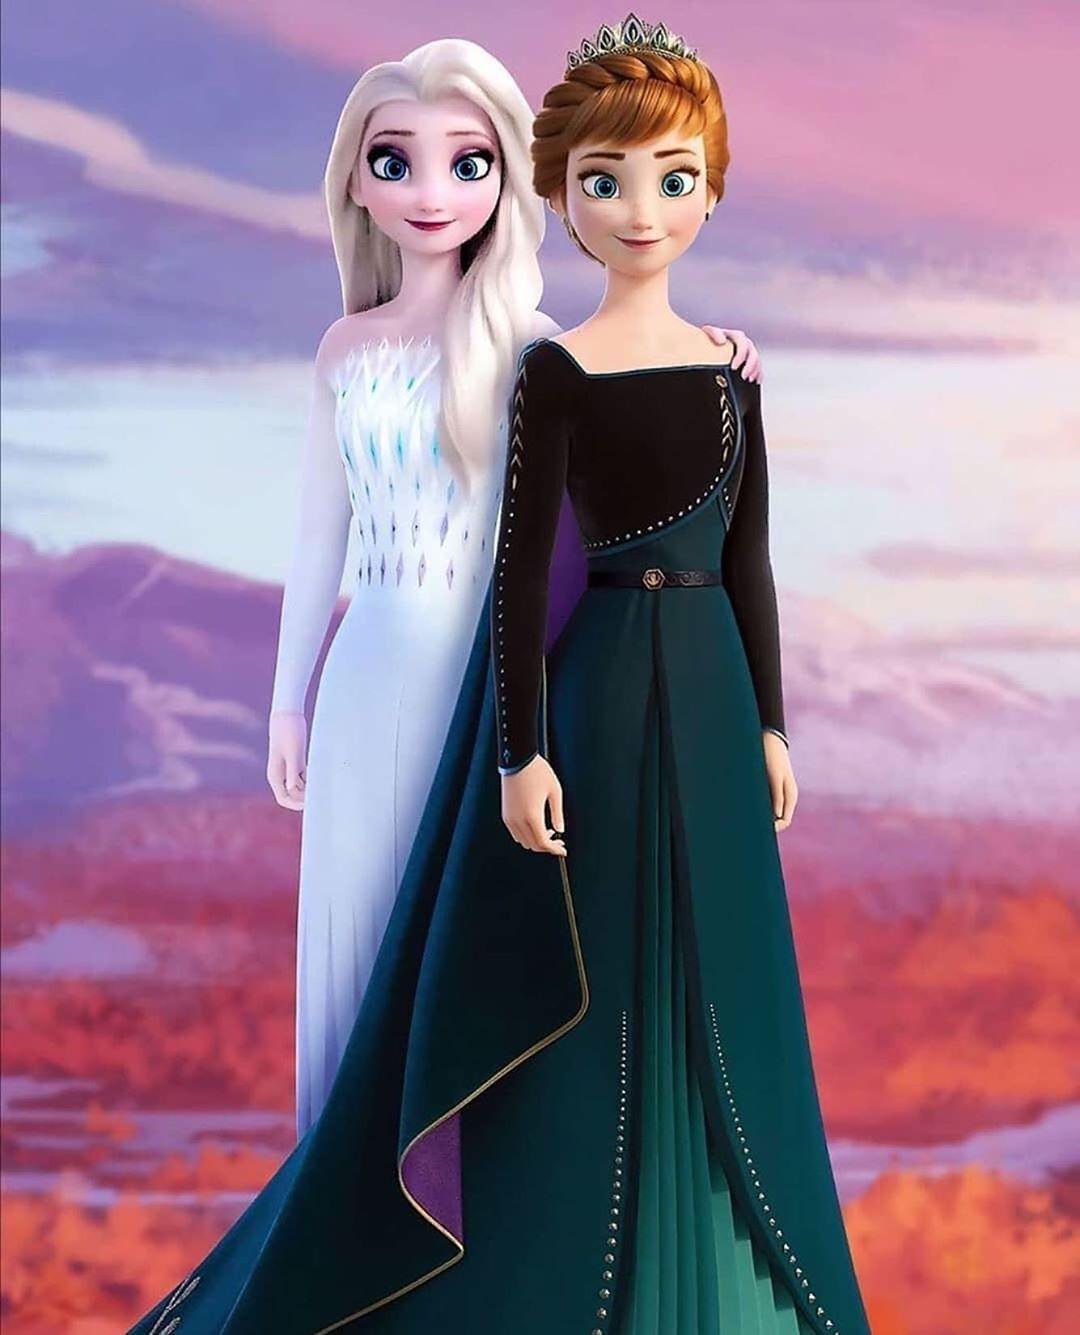 Elsa Anna Sisters Tag Yours London Cute Love Goals Stylish Perfect B Disney Princess Frozen Disney Frozen Elsa Frozen Disney Movie